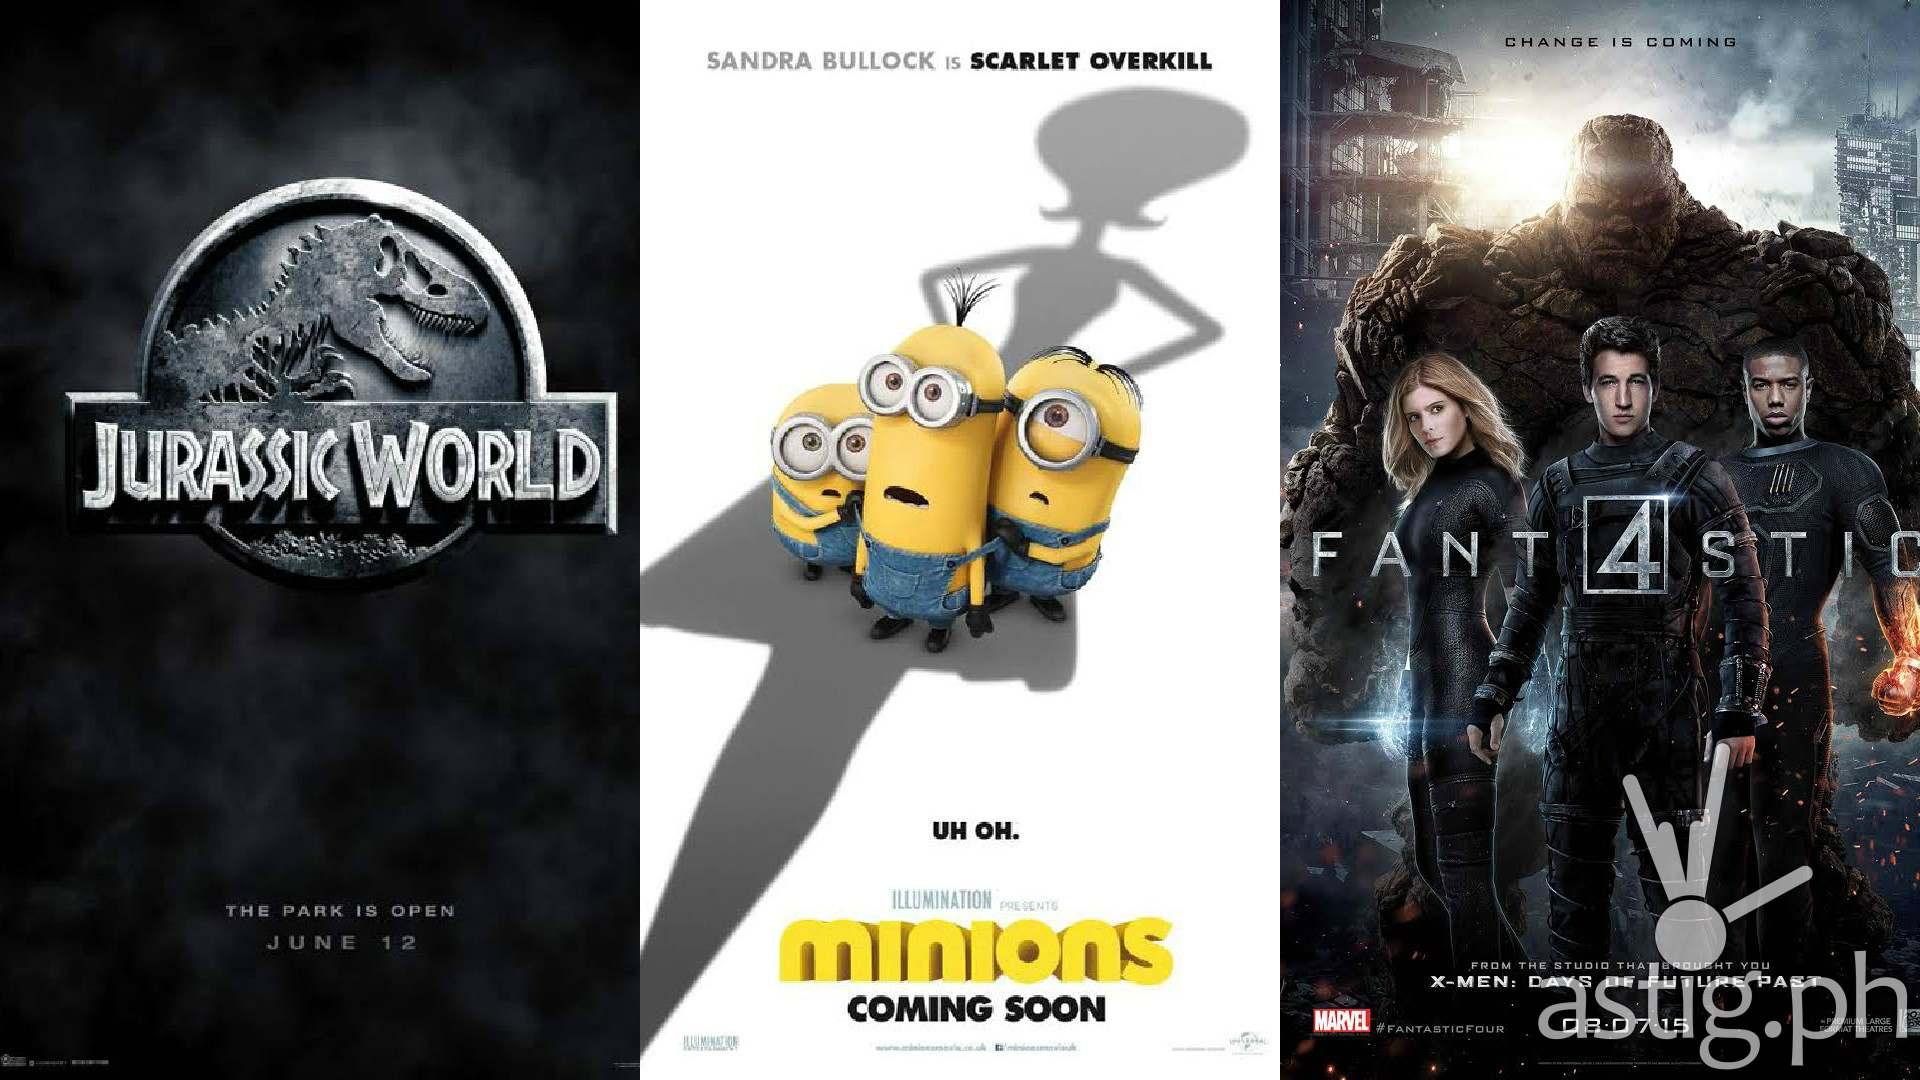 Jurassic World Minions Fantastic Four movie